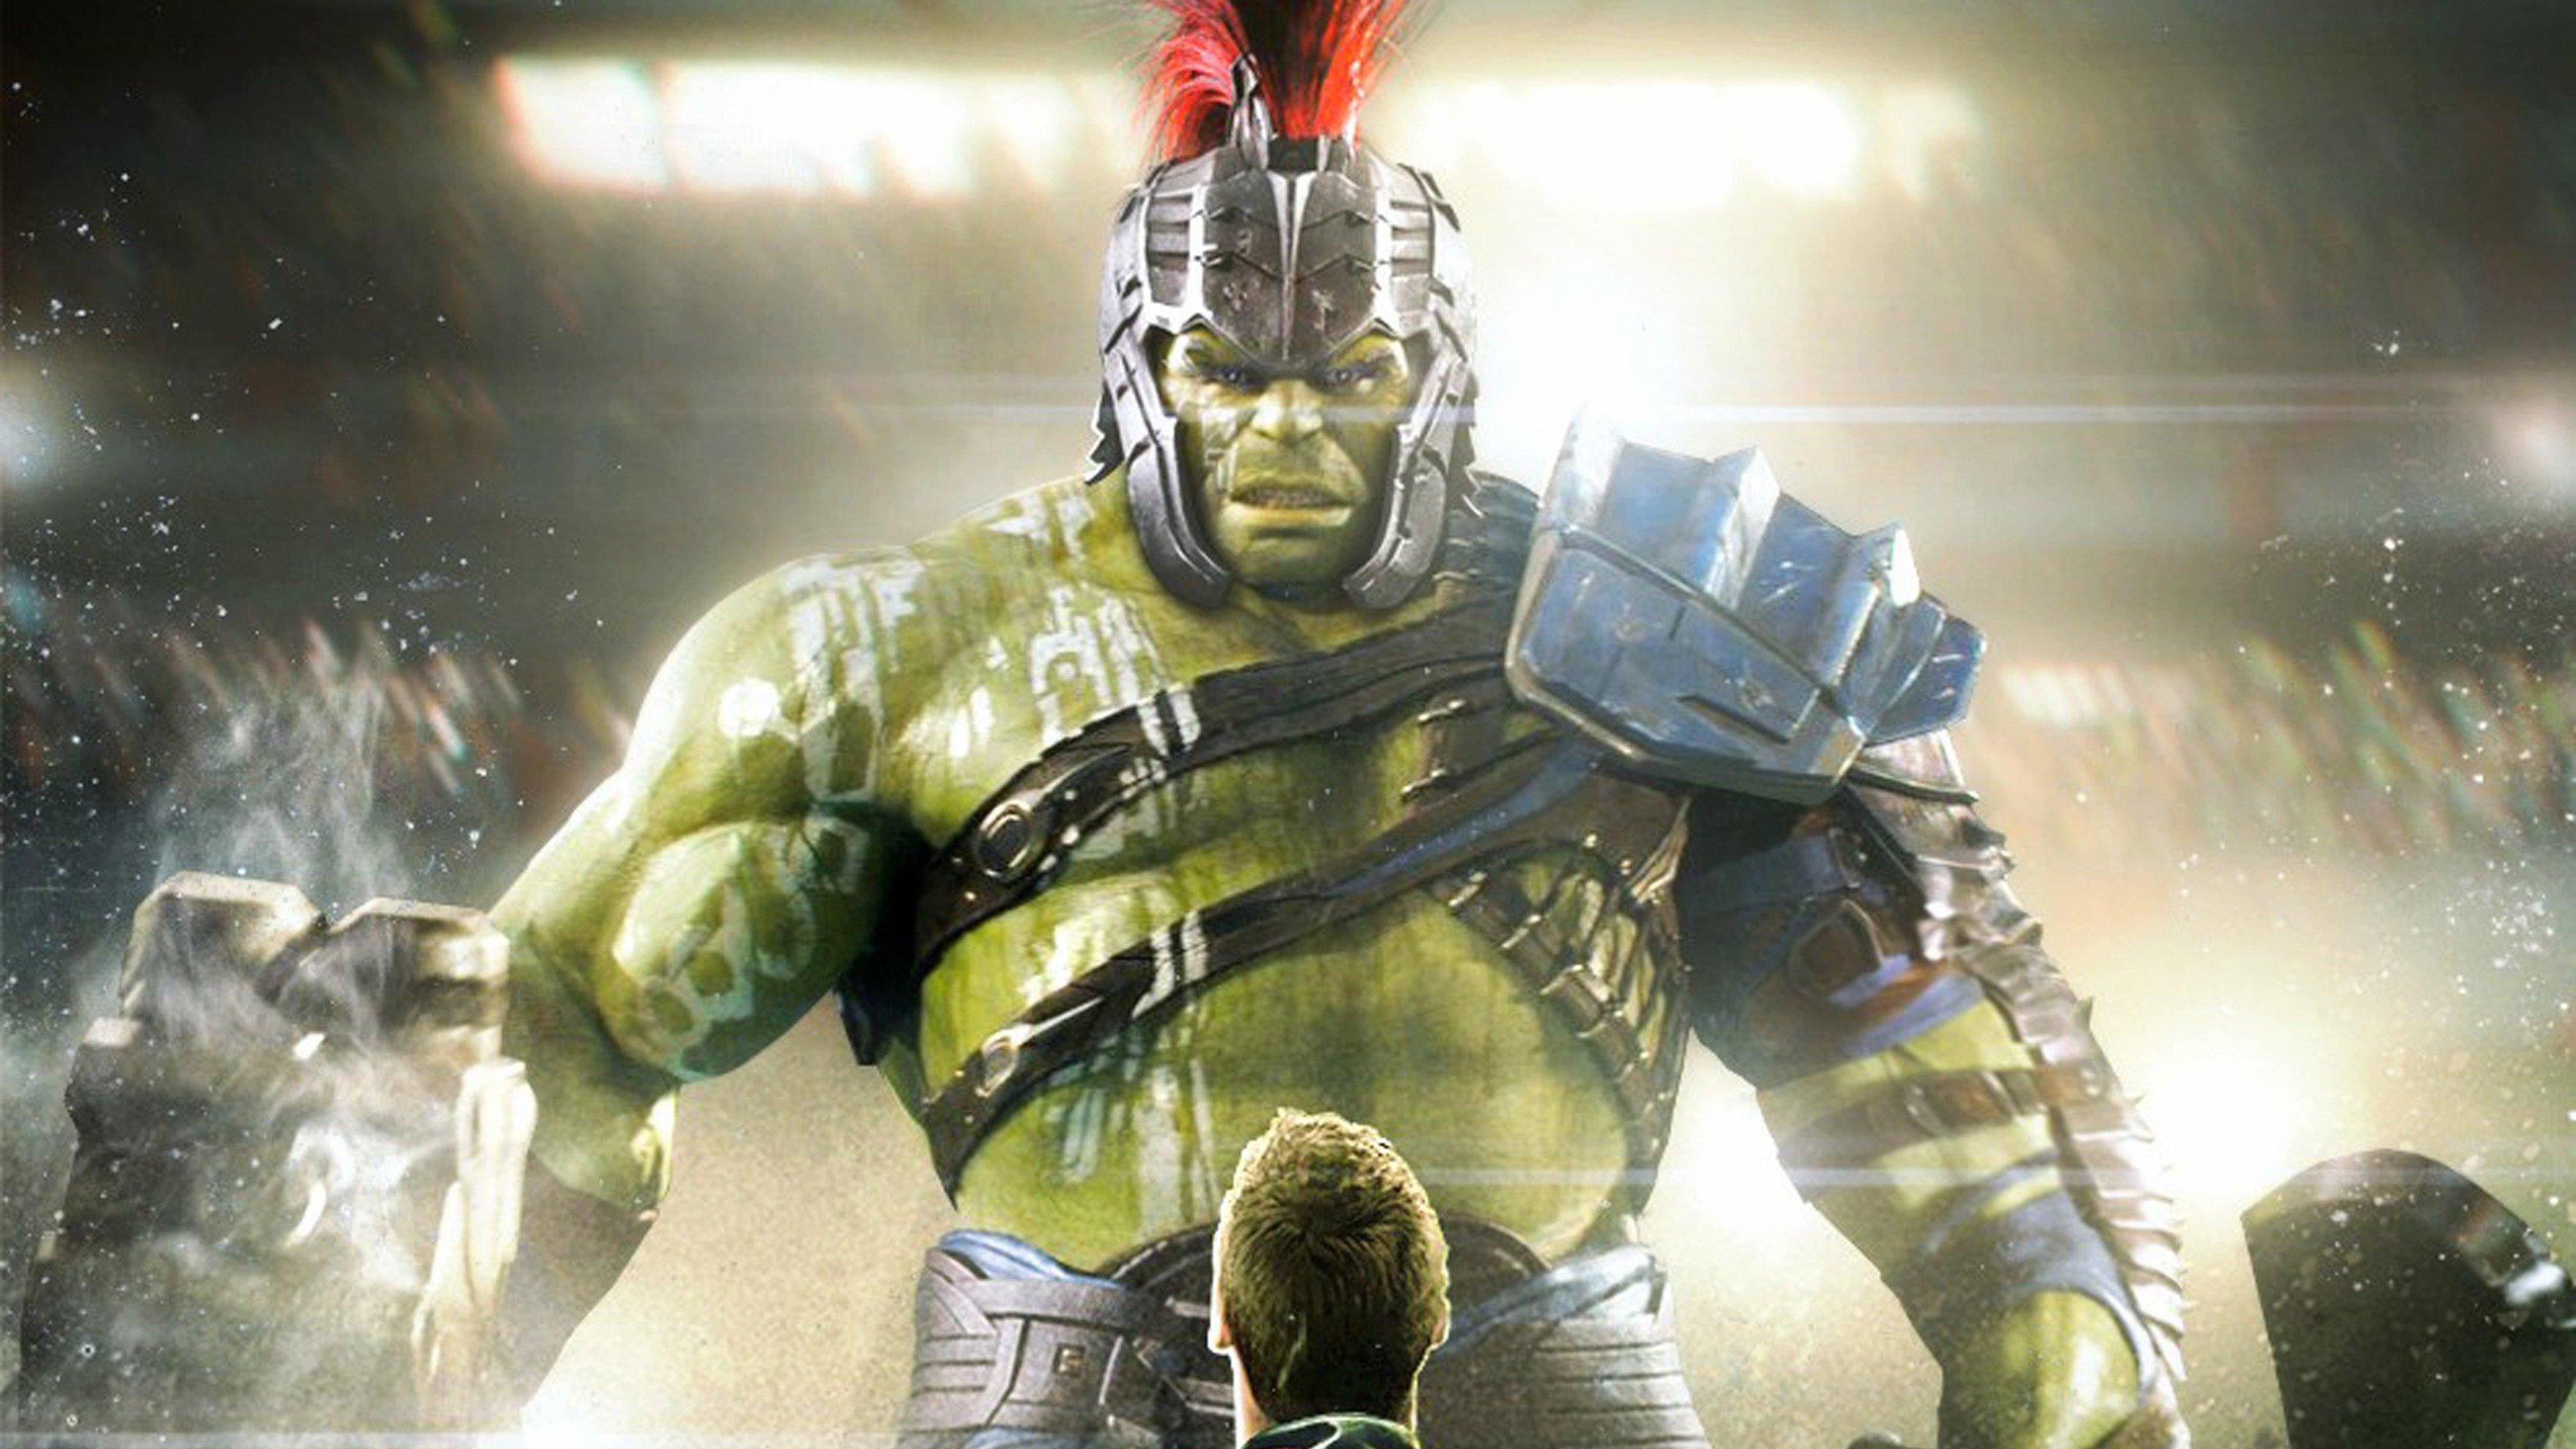 4K Image of Hulk HD Wallpapers 3840x2160